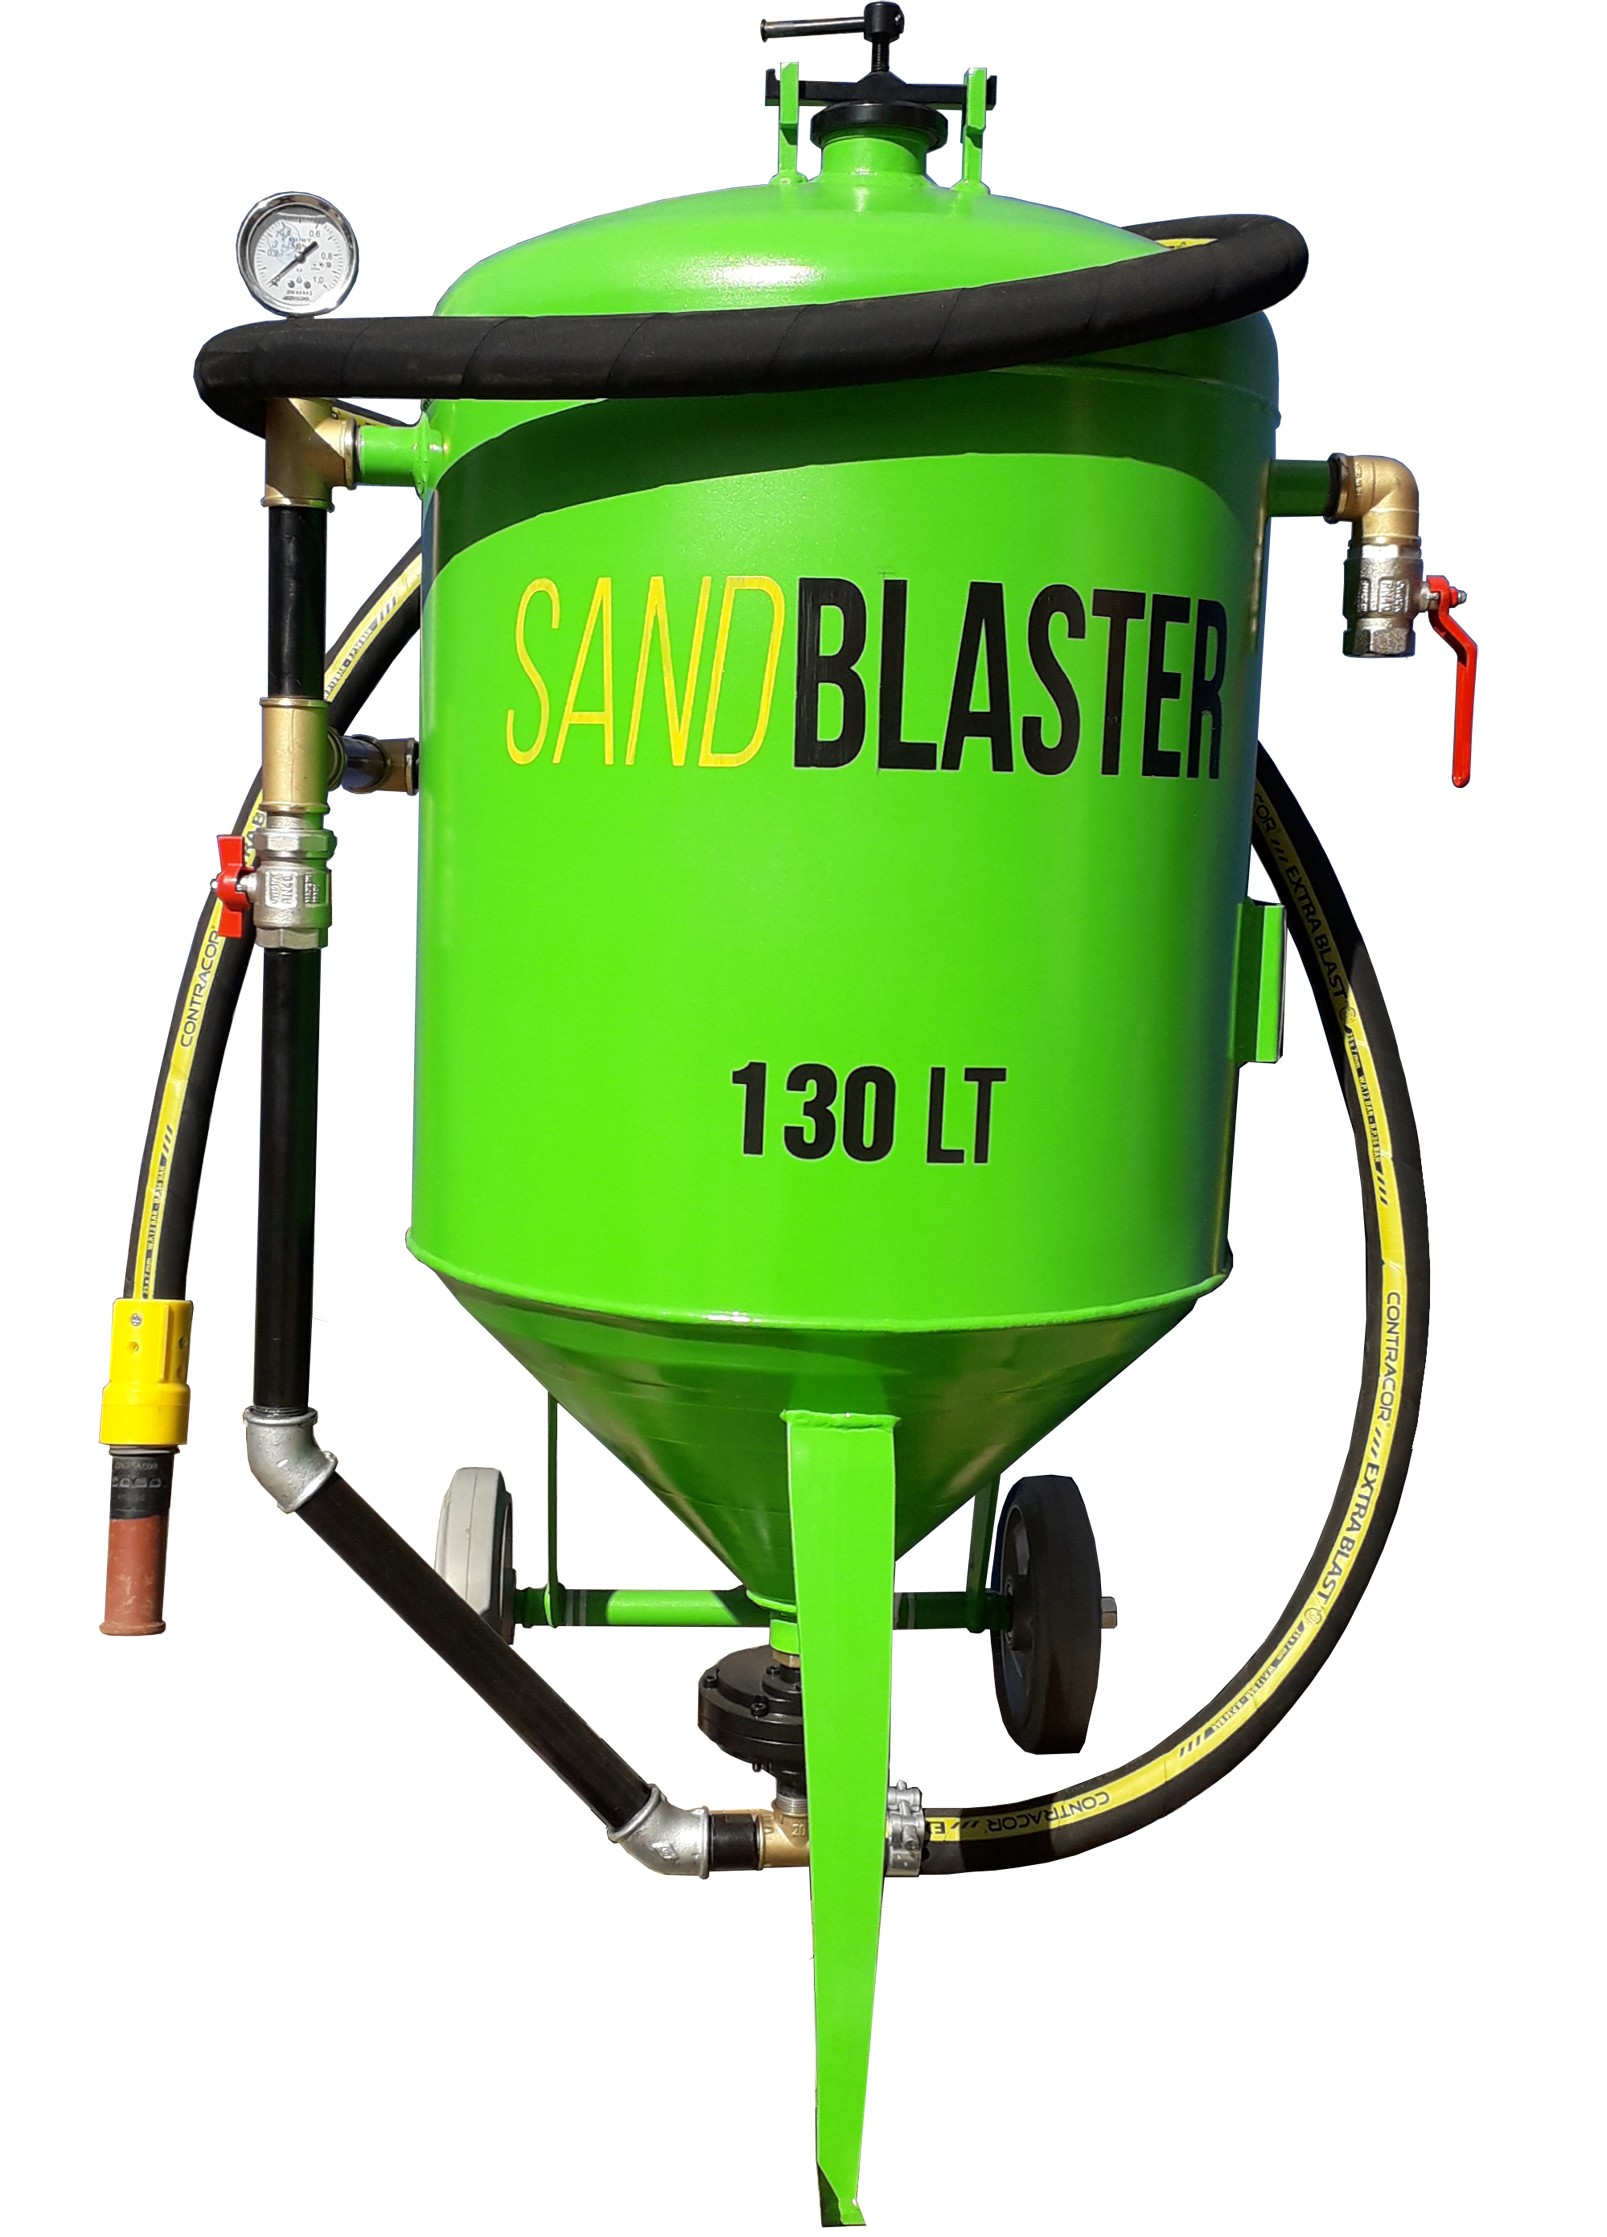 sandblaster-130lt